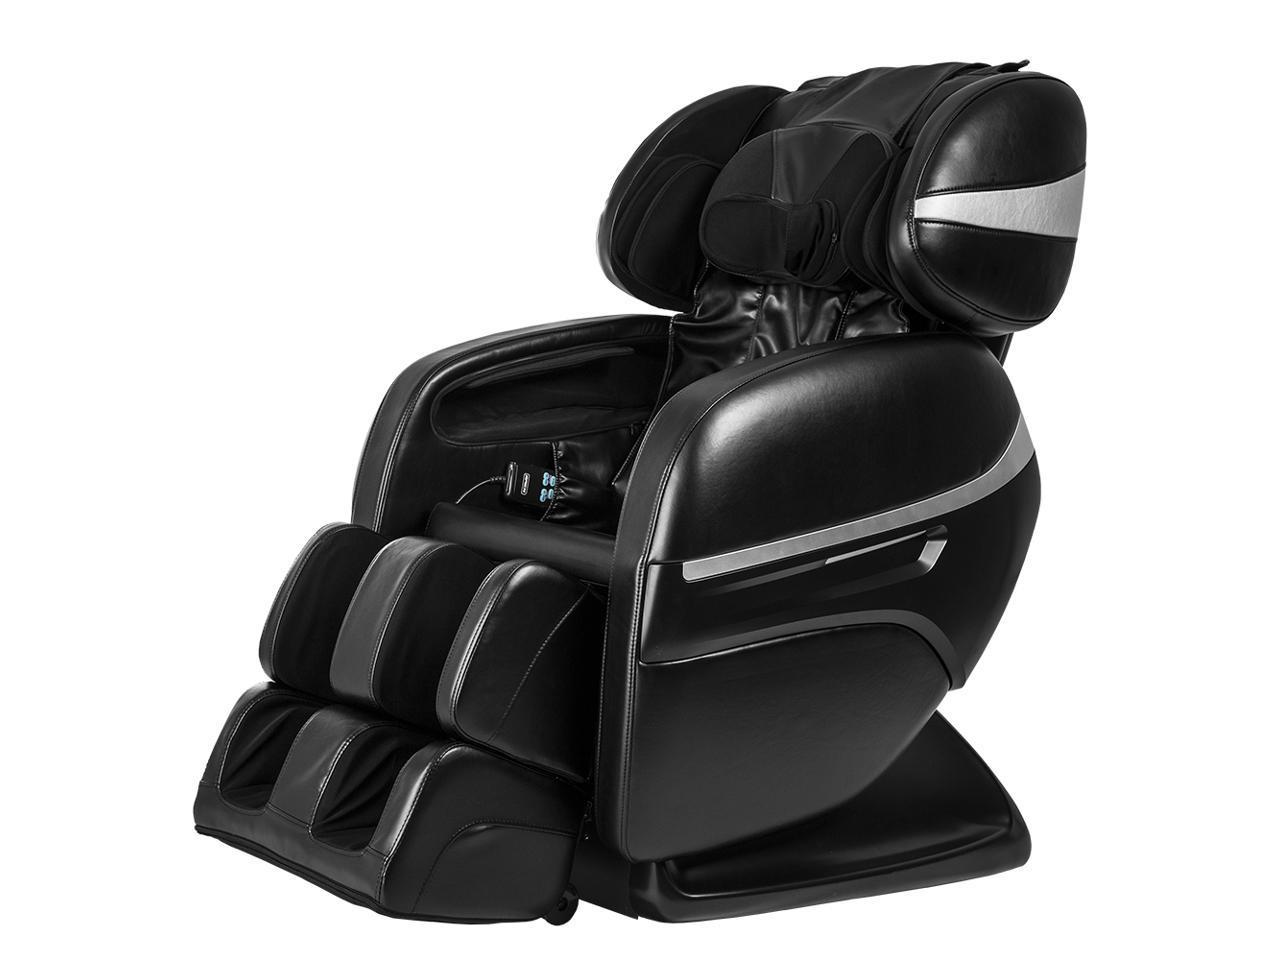 Titan Osaki Full Body Massage Chairs: Starting From $699 + Free Shipping